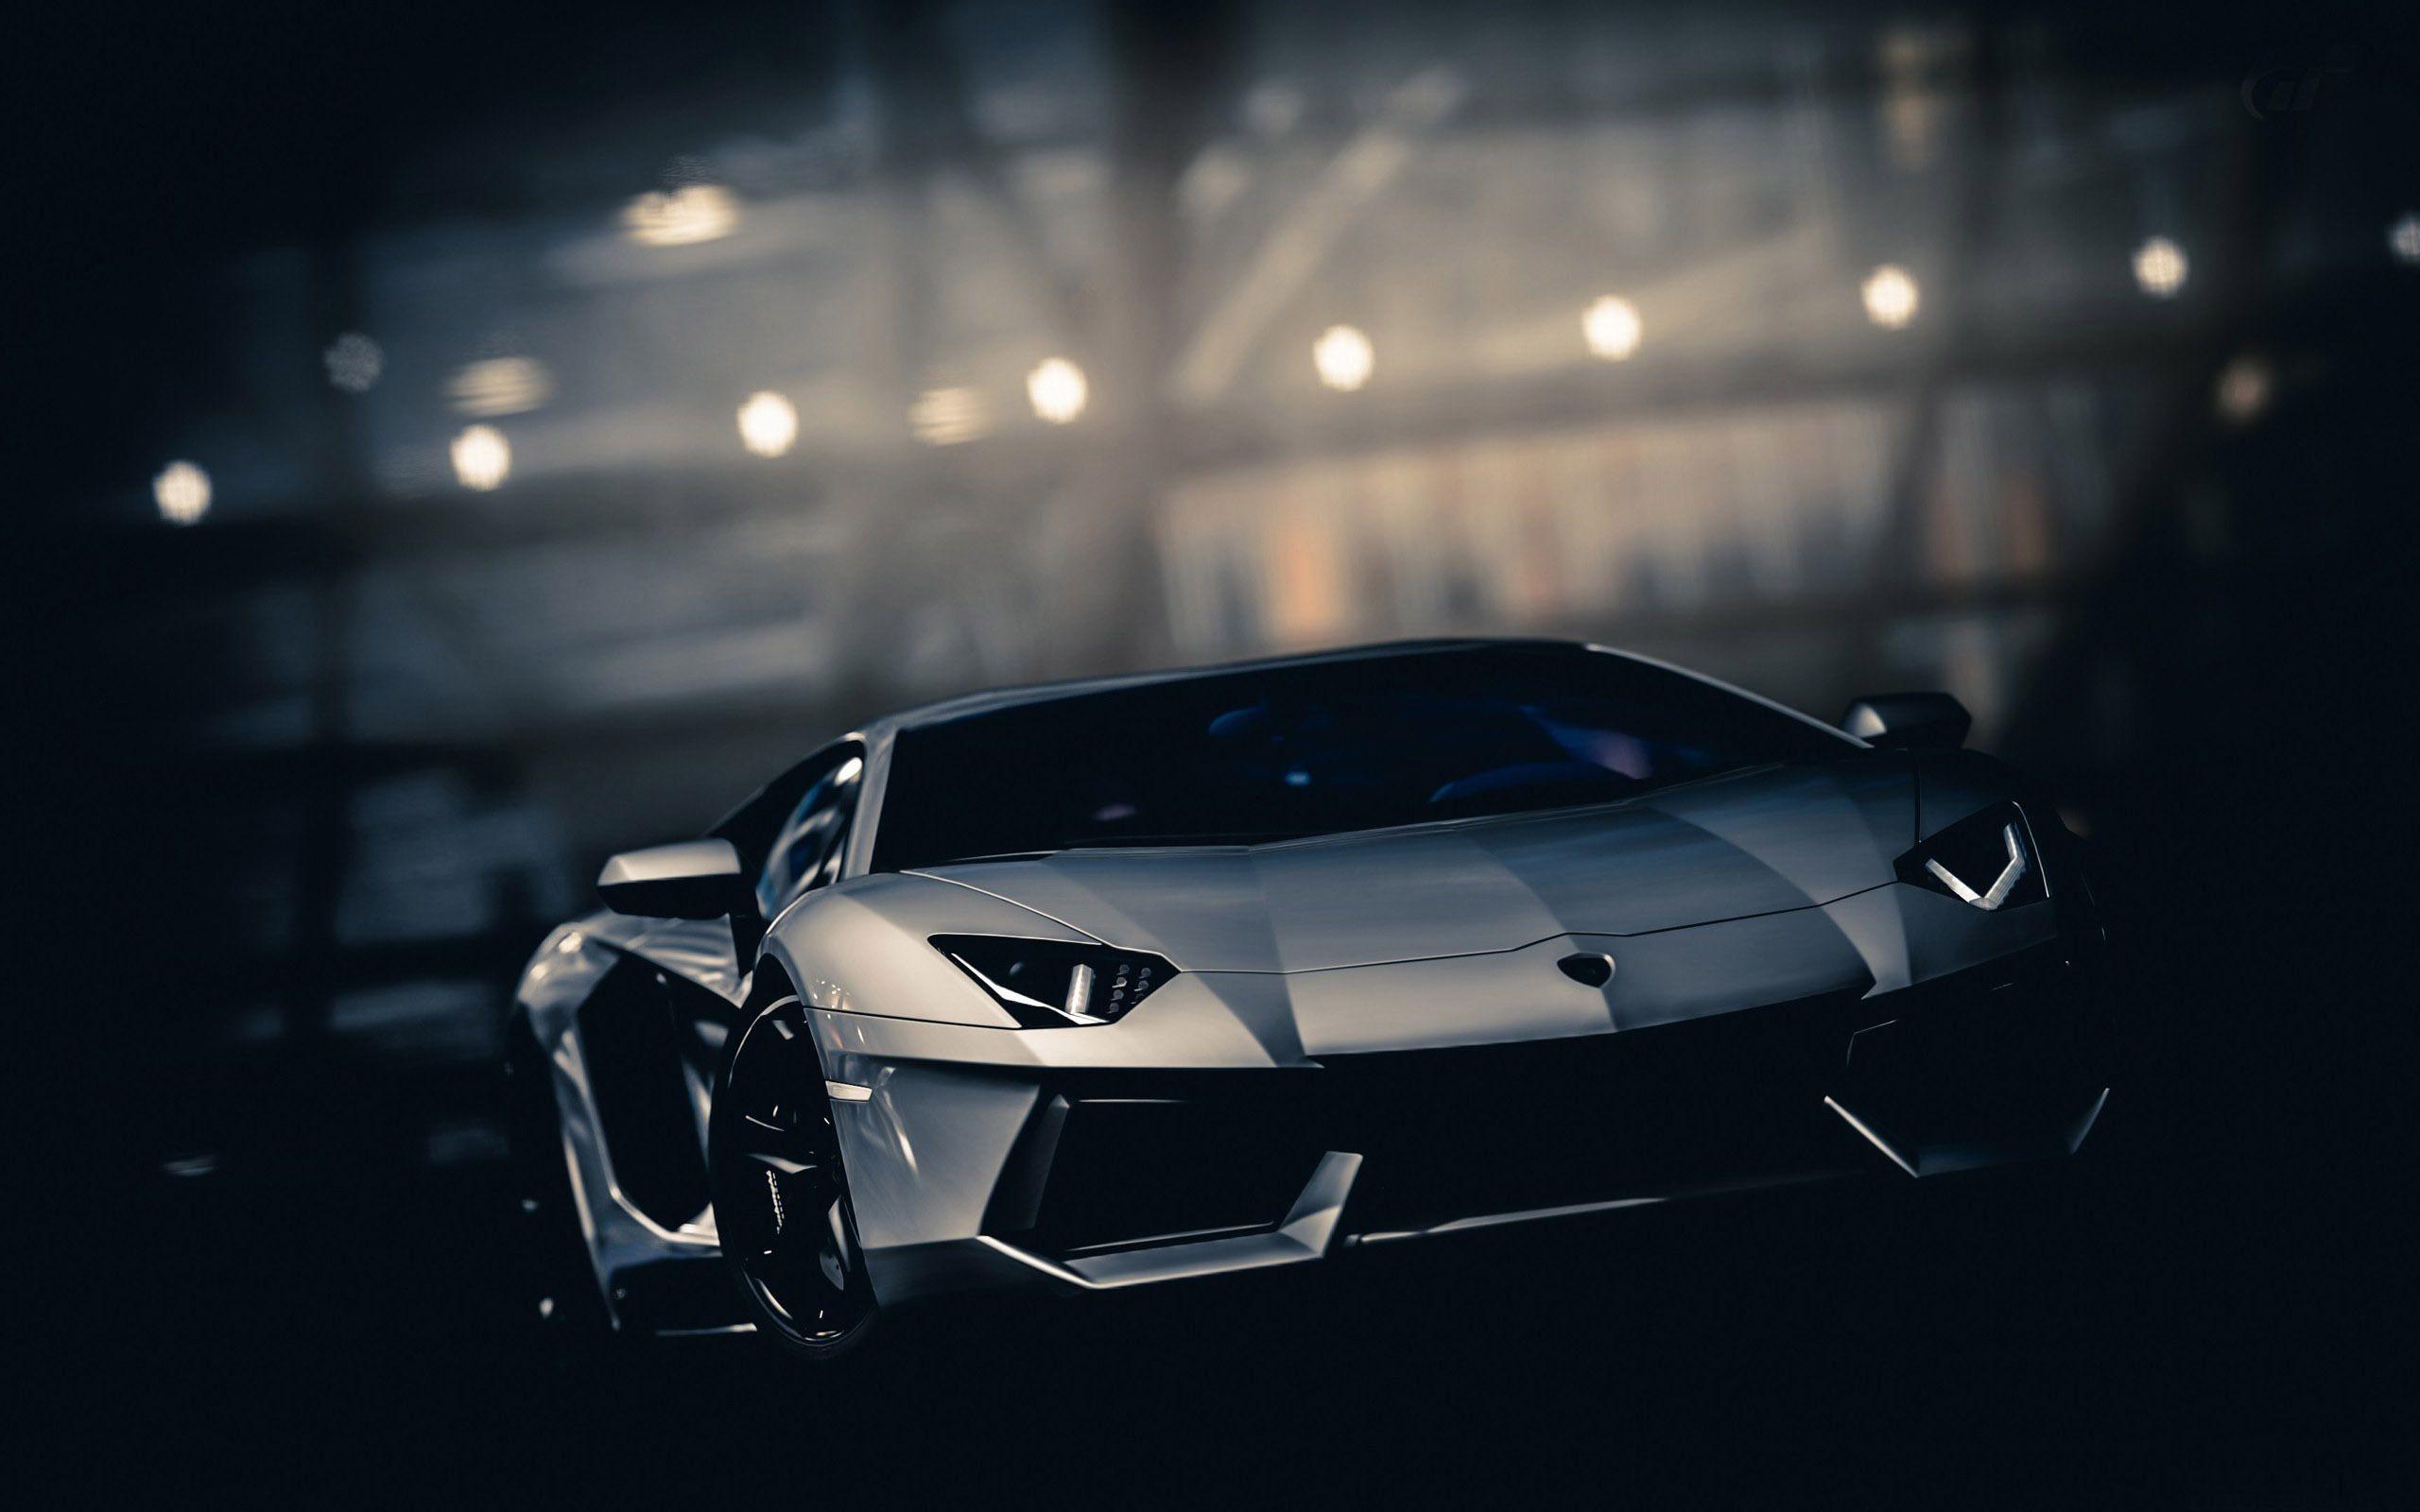 Lamborghini Wallpaper Cave 55 Images